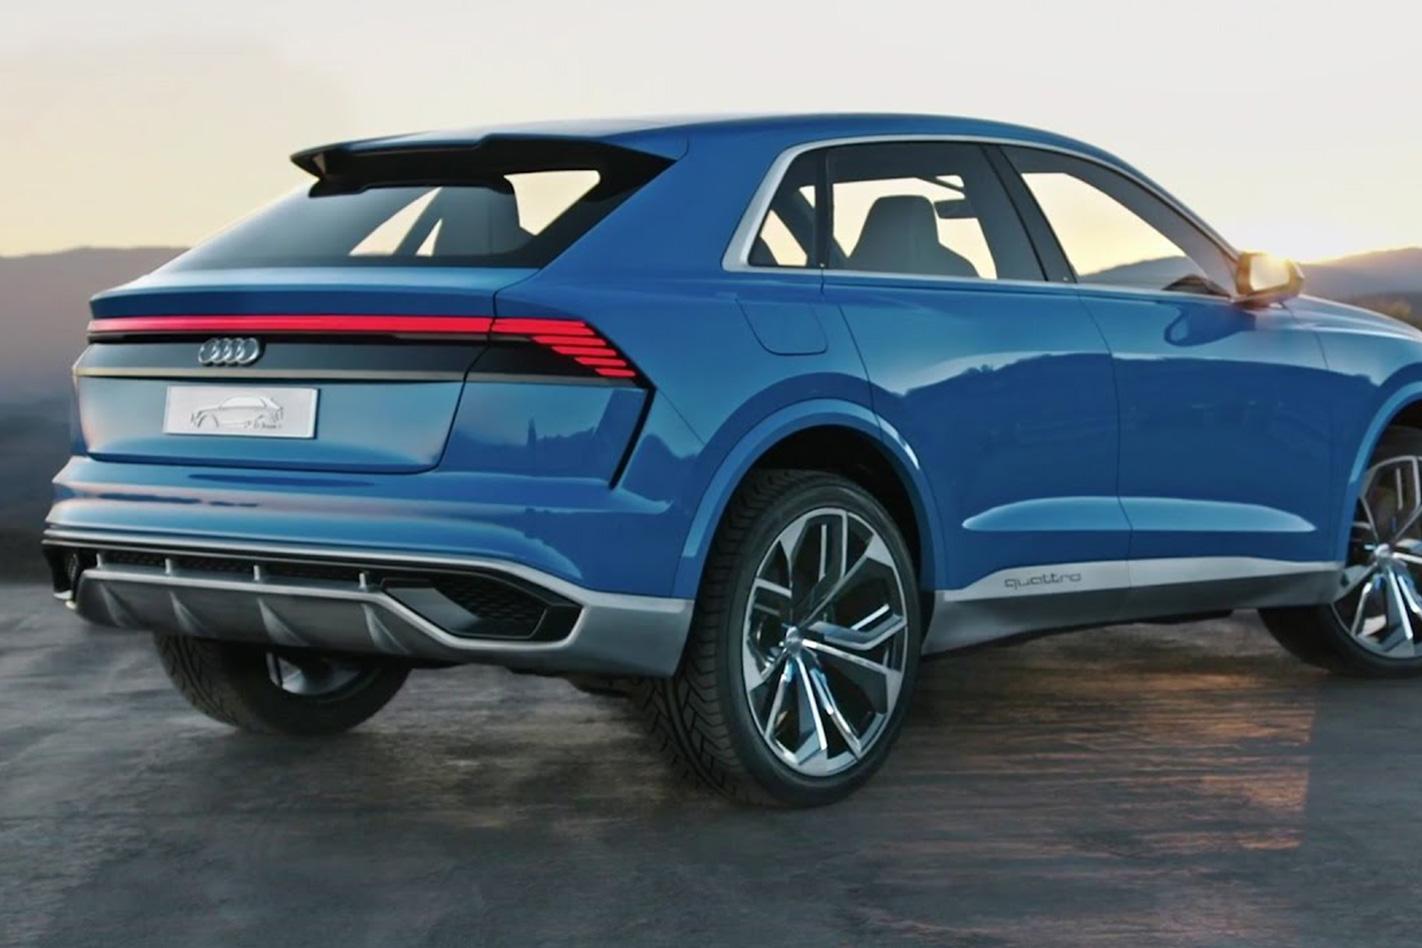 2020 Audi Q8: News, SQ8, RS Q8, Price >> 2019 Audi Rs Q8 Breaks Company Power Ceiling Report